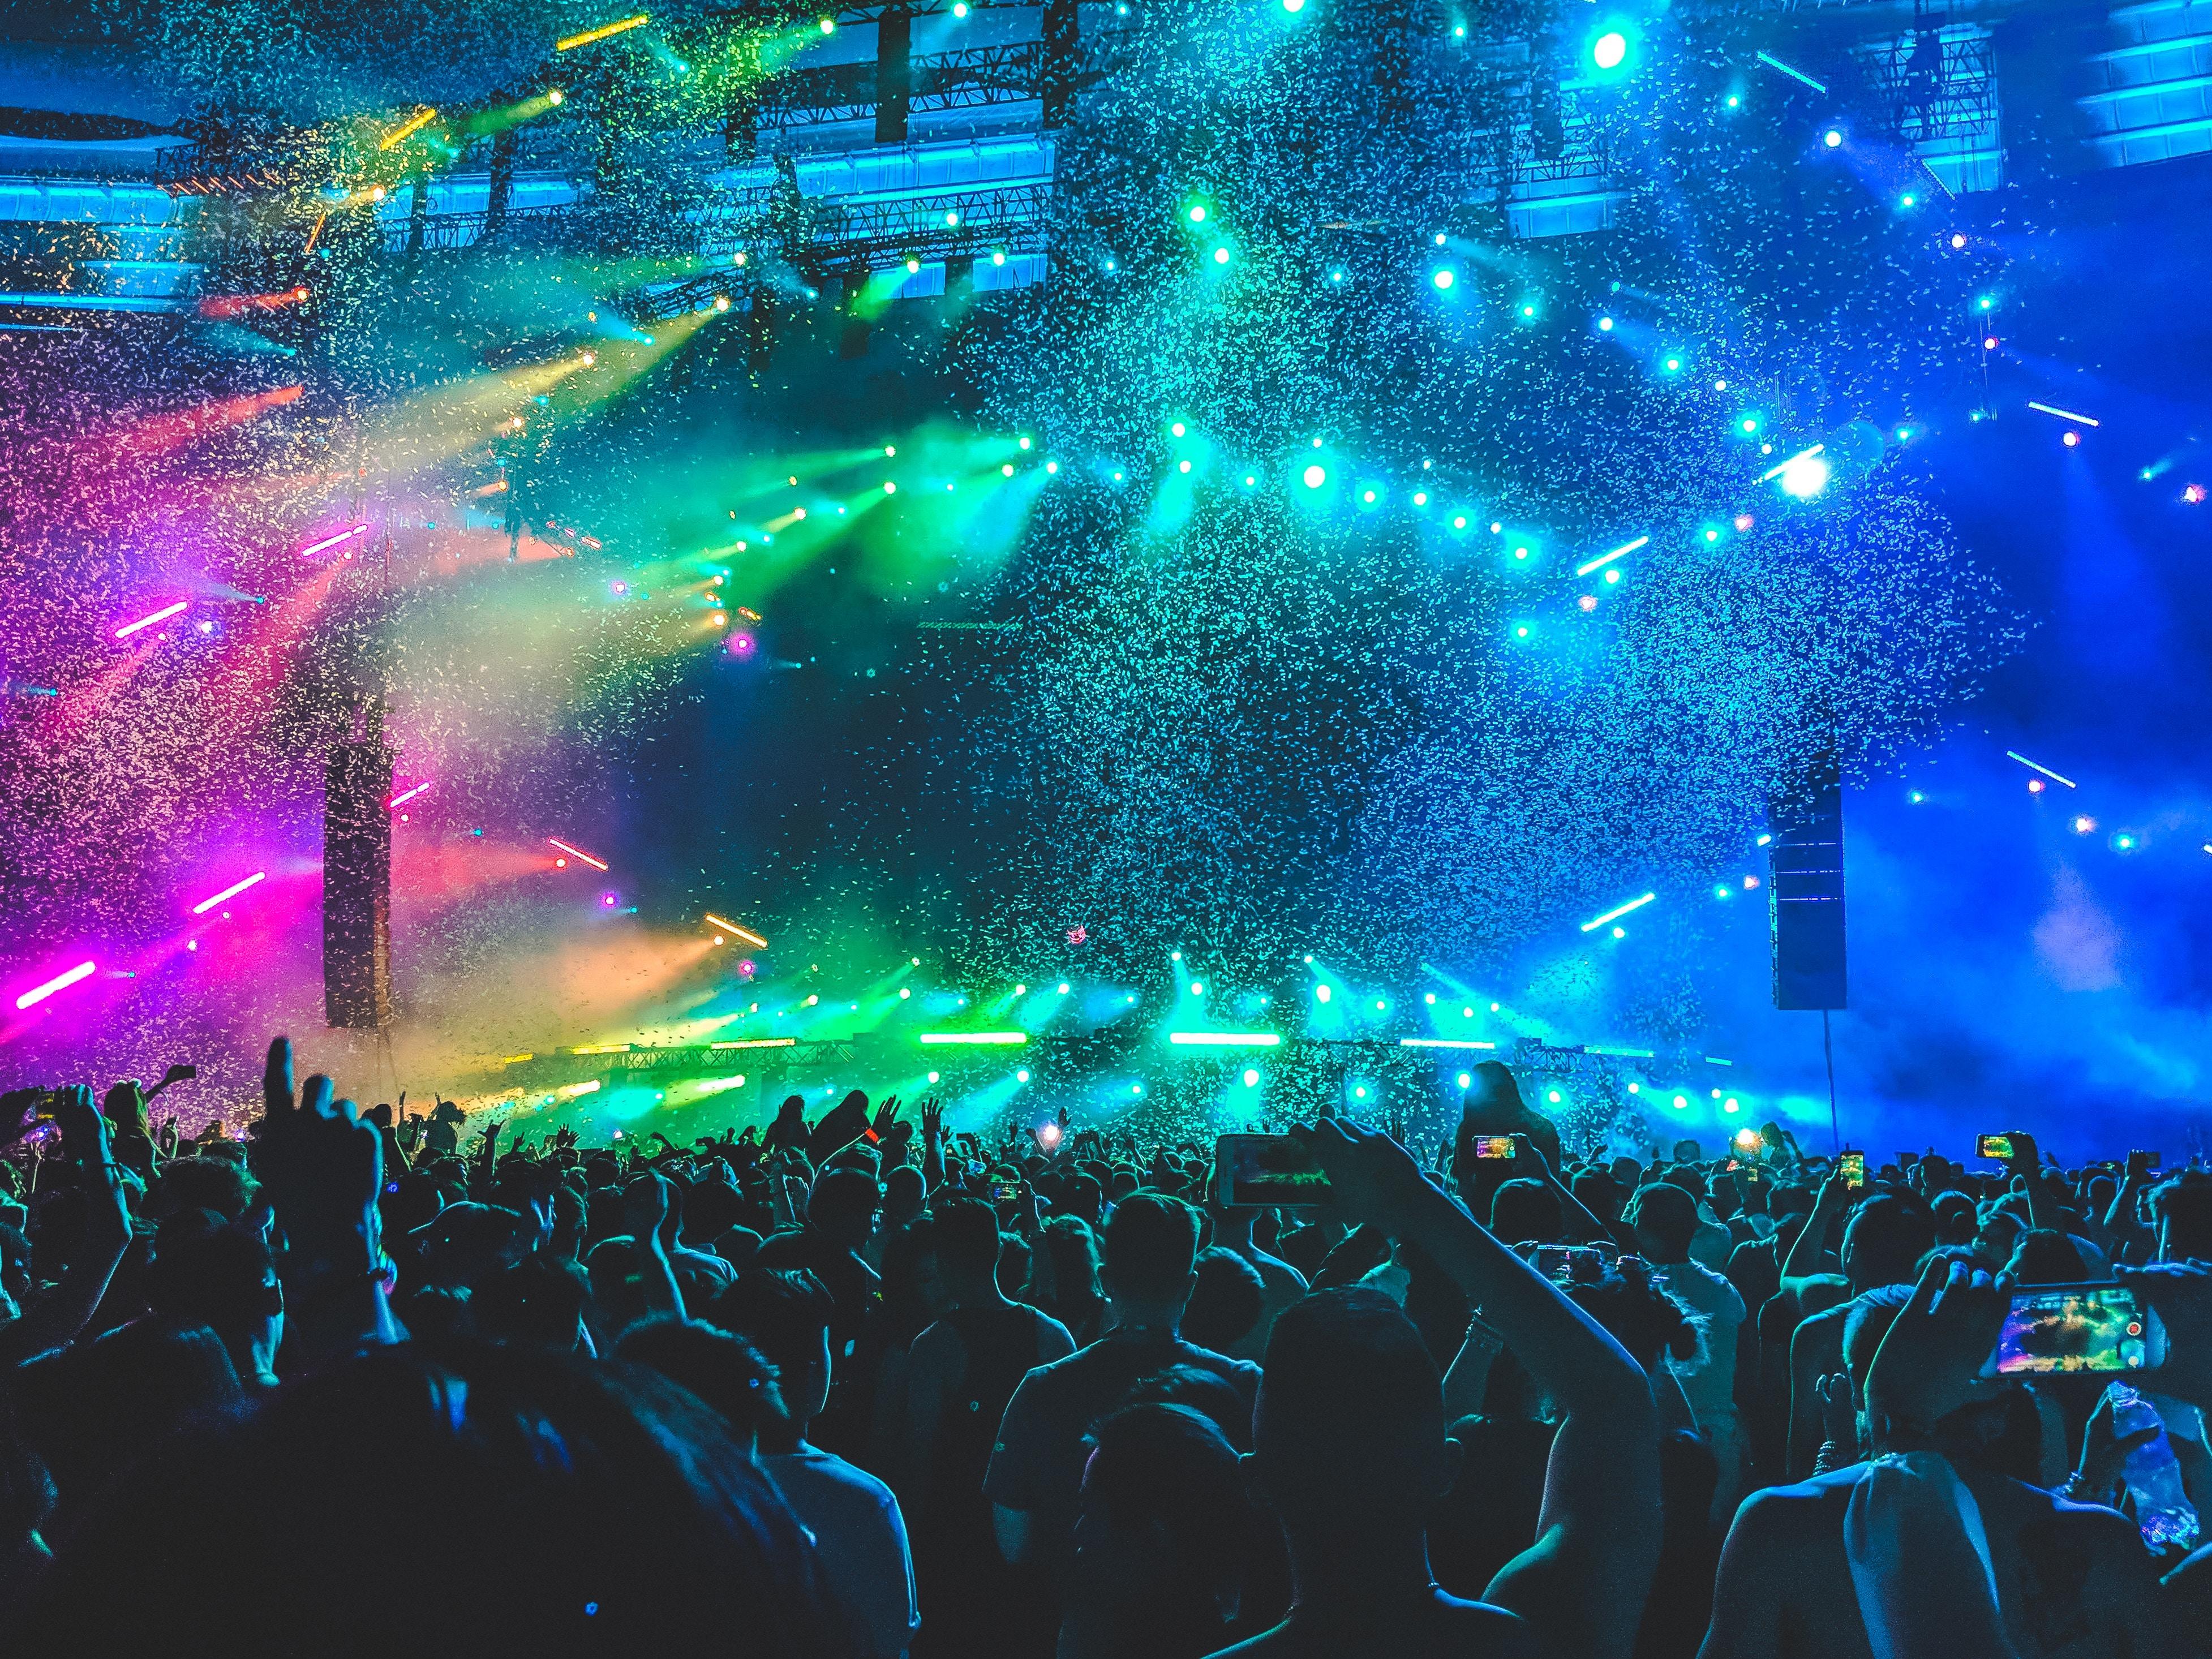 An electronic dance music (EDM) concert.